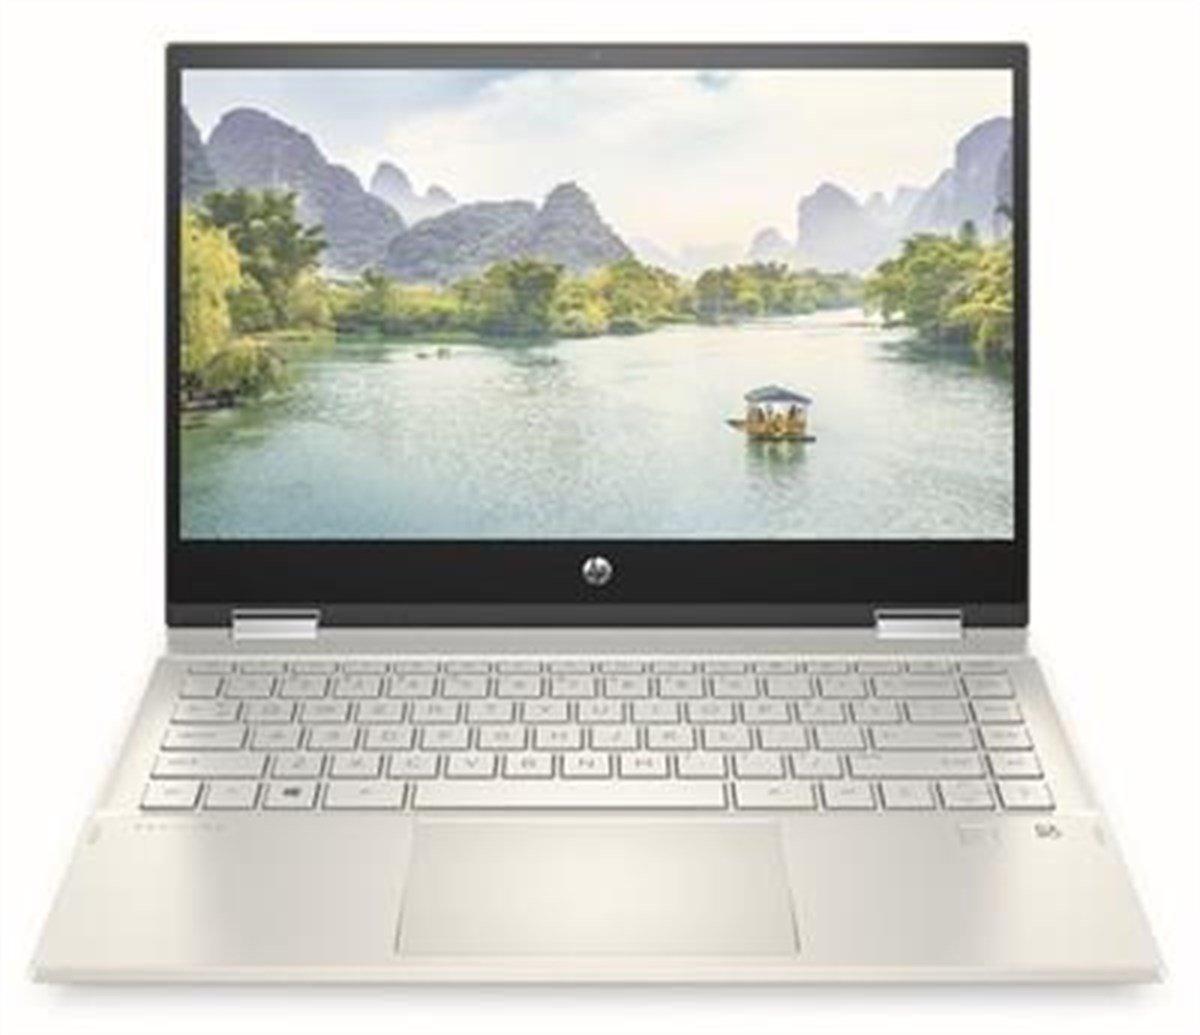 HP PAVILION 14M-DW1023DX i5-1115G1 8GB RAM 256 GB SSD 14'' WIN10